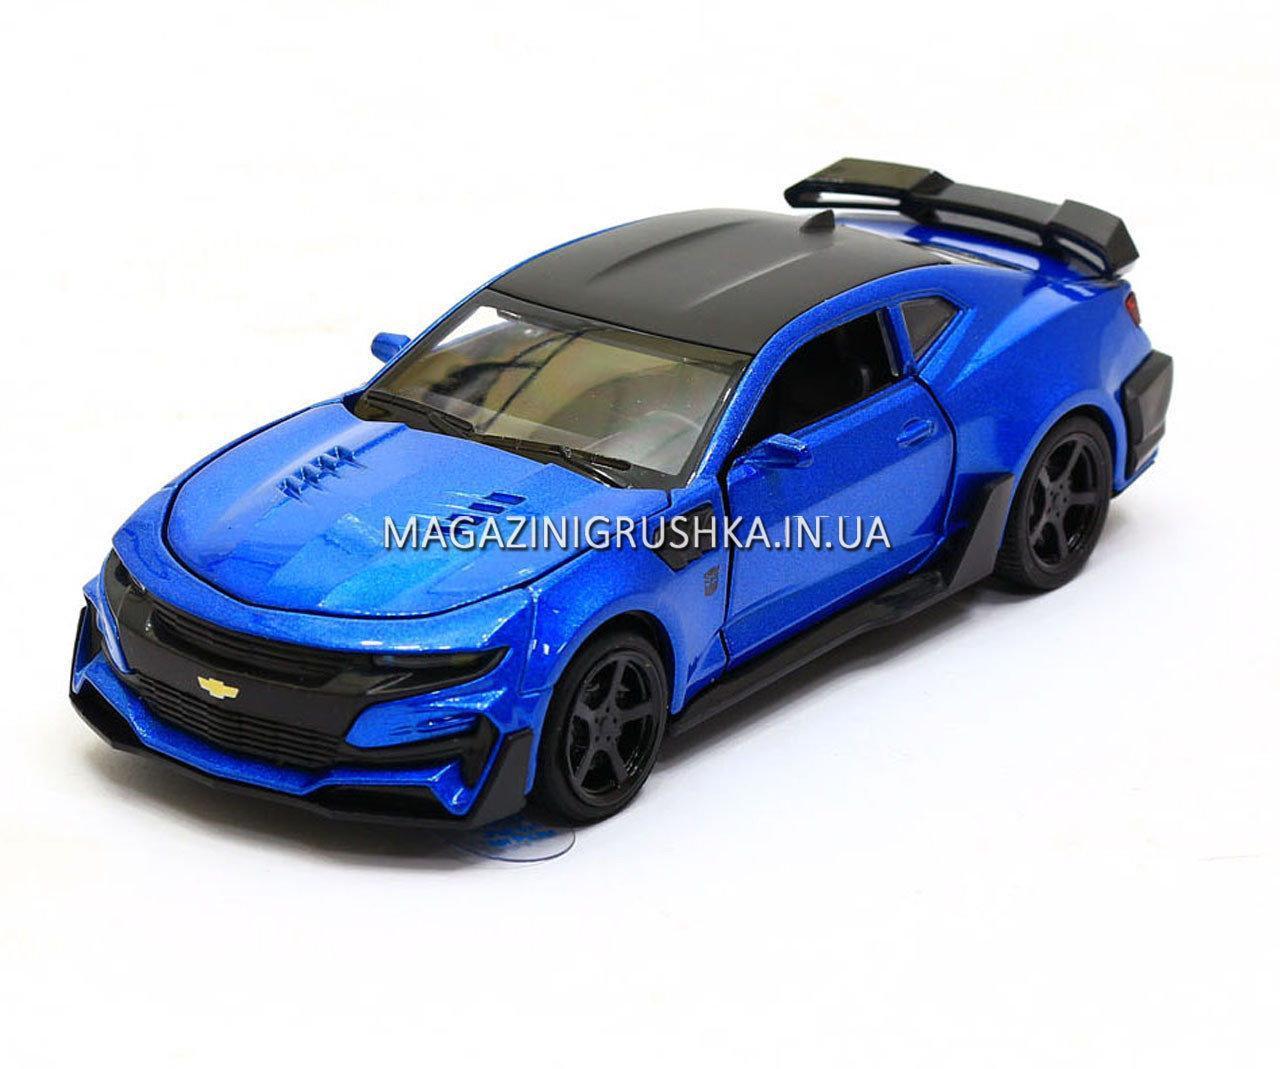 Машинка модель Автопром Chevrolet Сamaro (Шевроле Камаро) Синий арт.7645